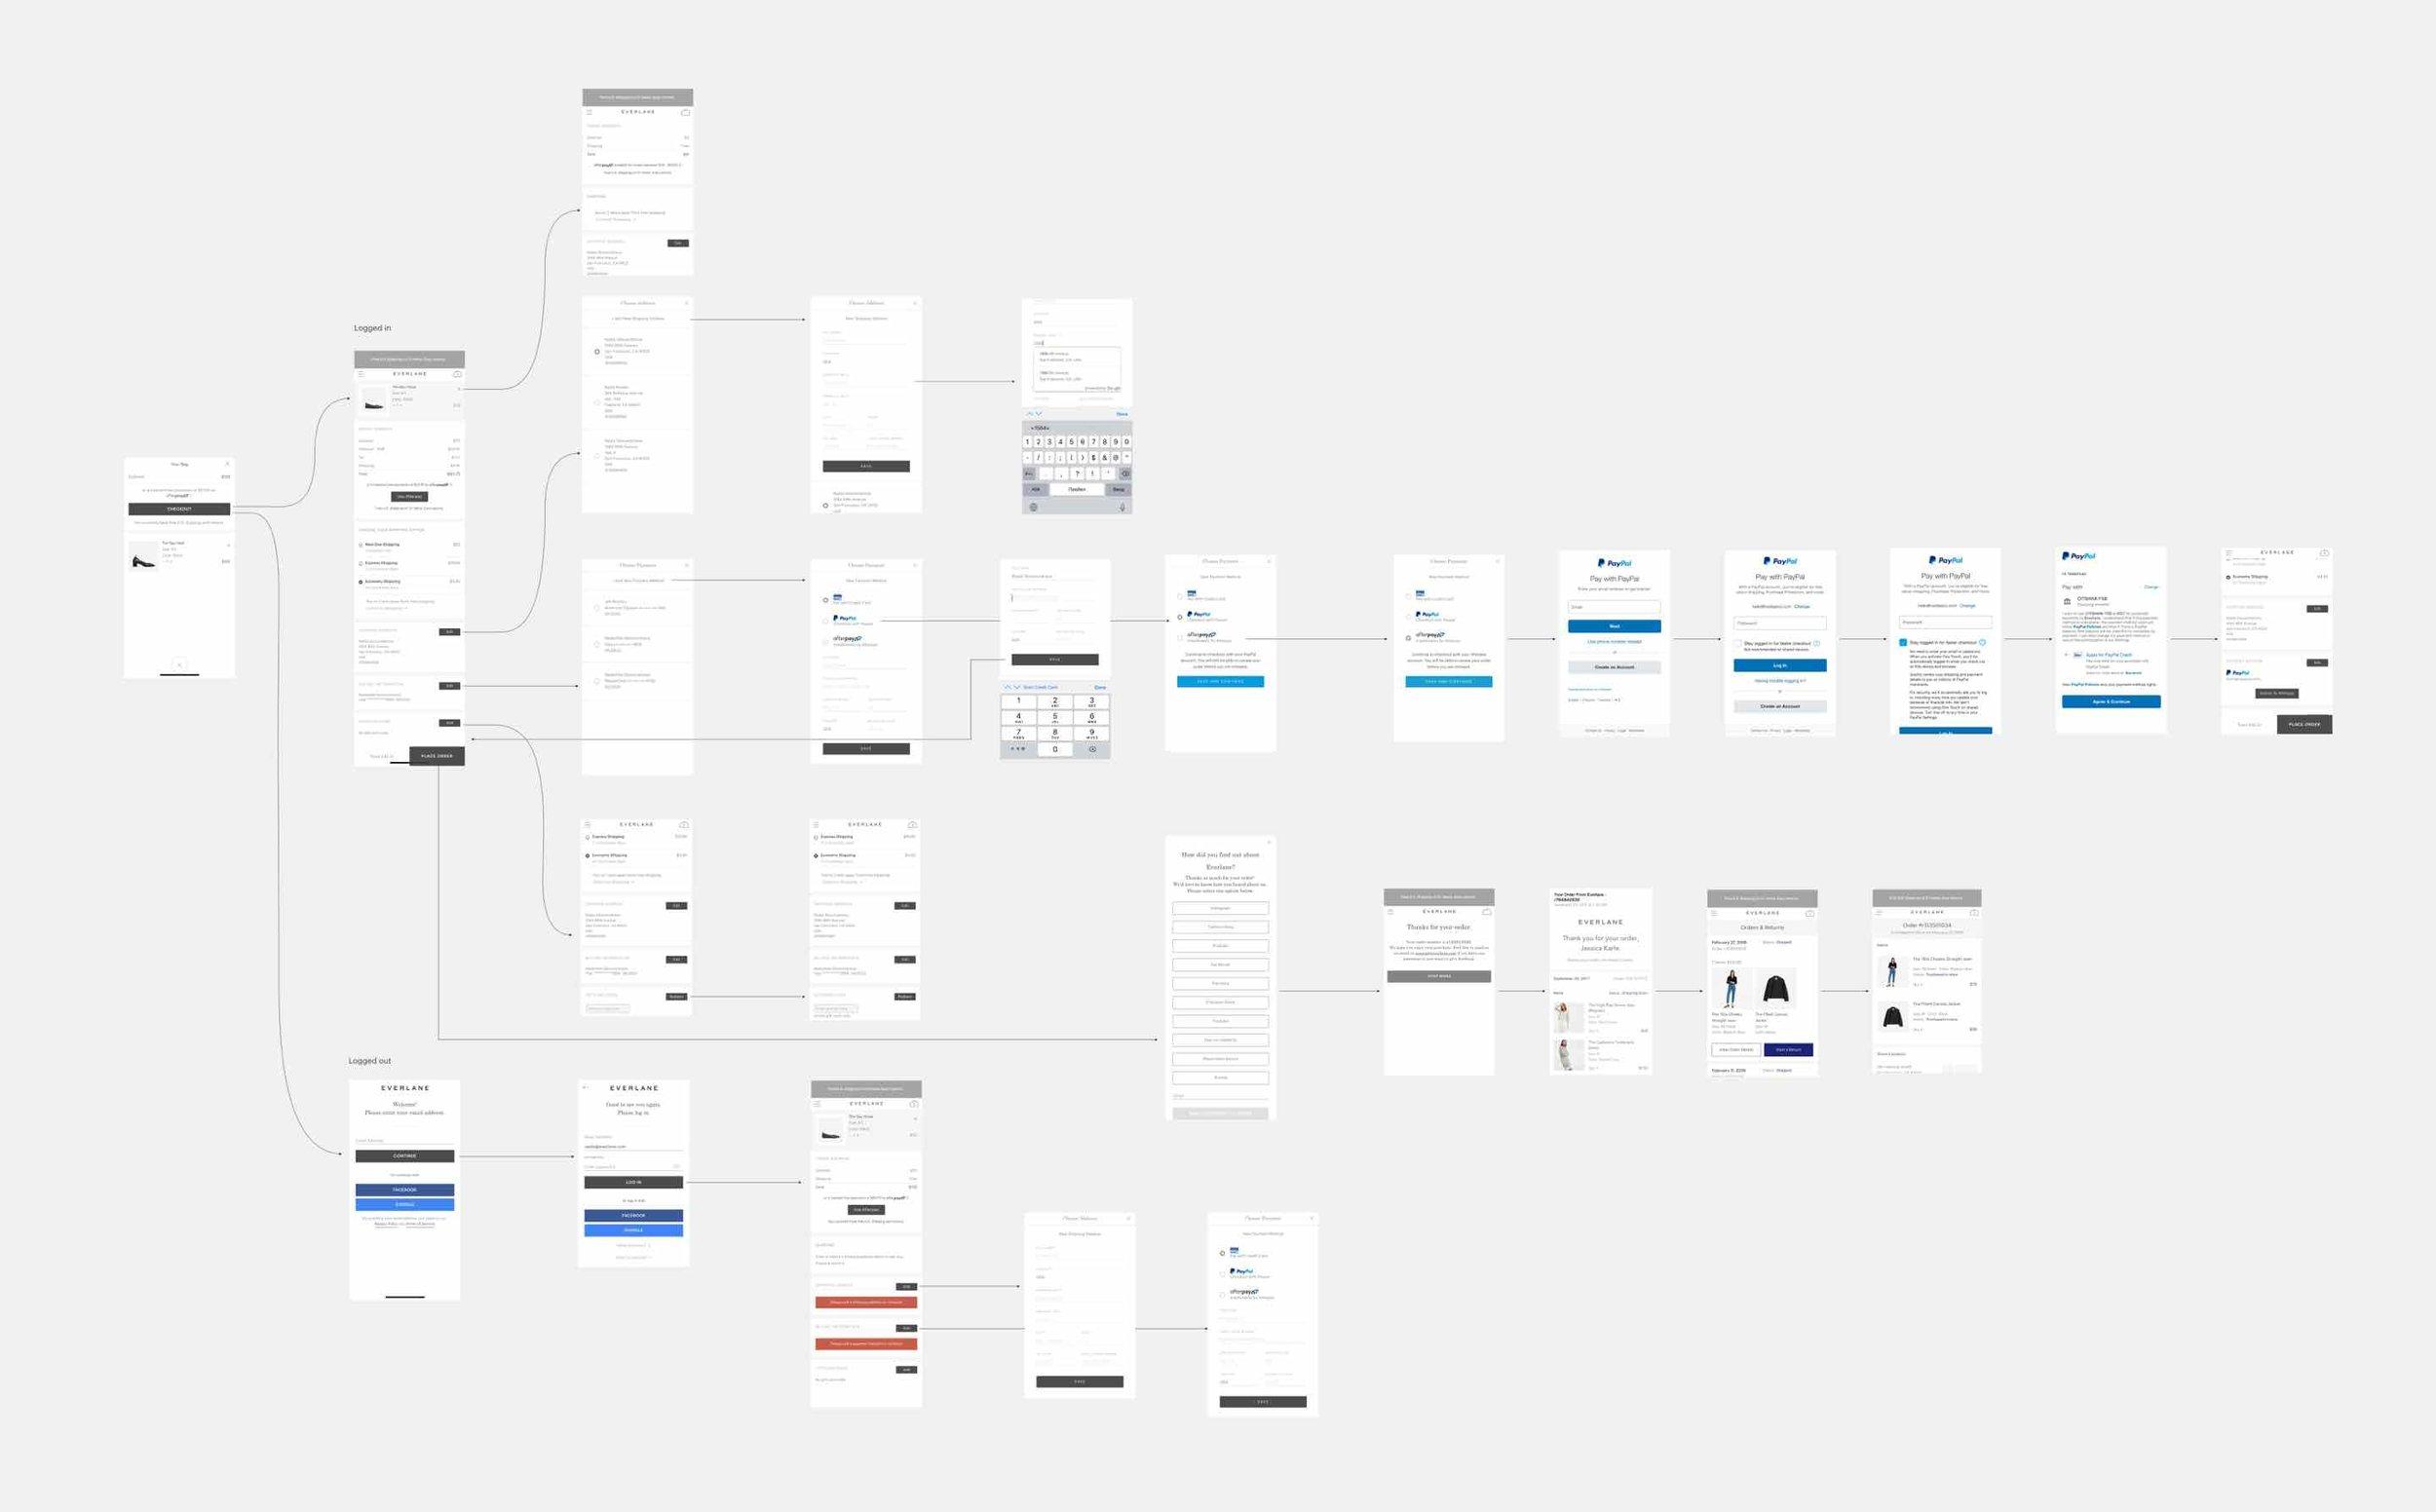 everlane_mobile_checkout_old_flow.jpg